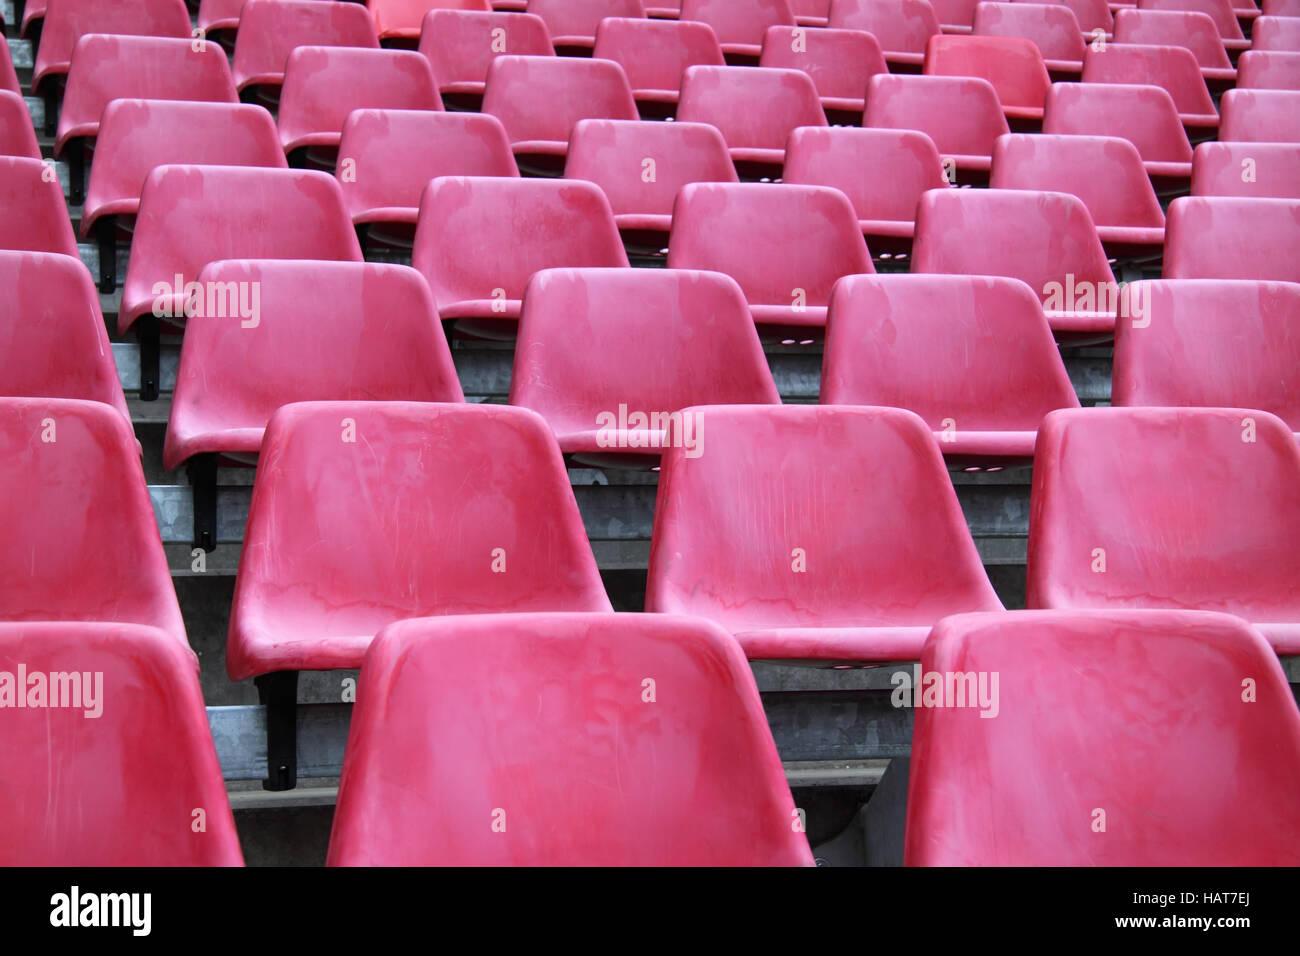 Seat - Stock Image